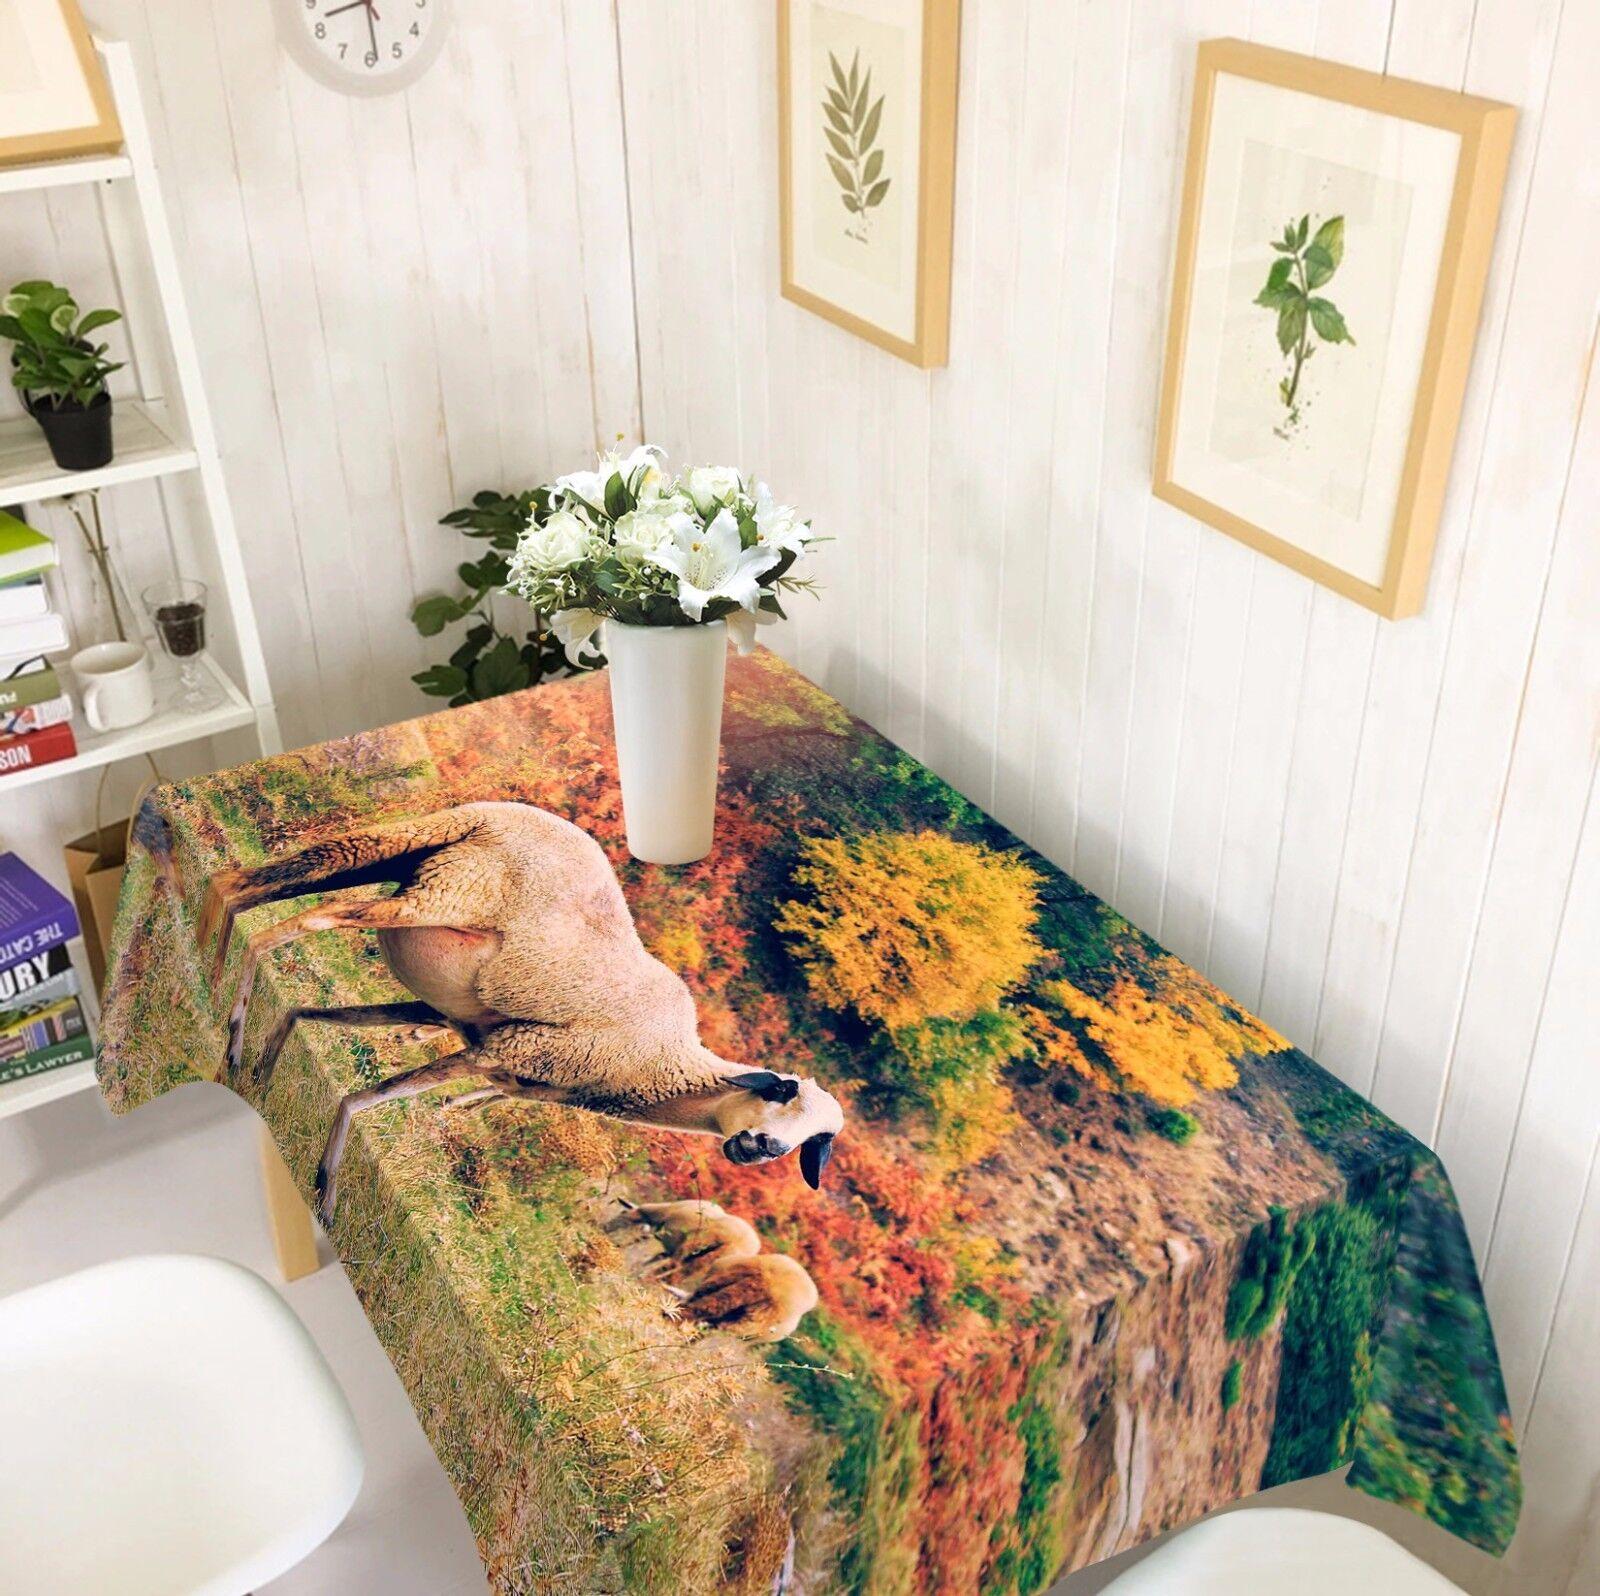 3D Sheep Tablecloth Table Cover Cloth Birthday Party AJ WALLPAPER UK Lemon